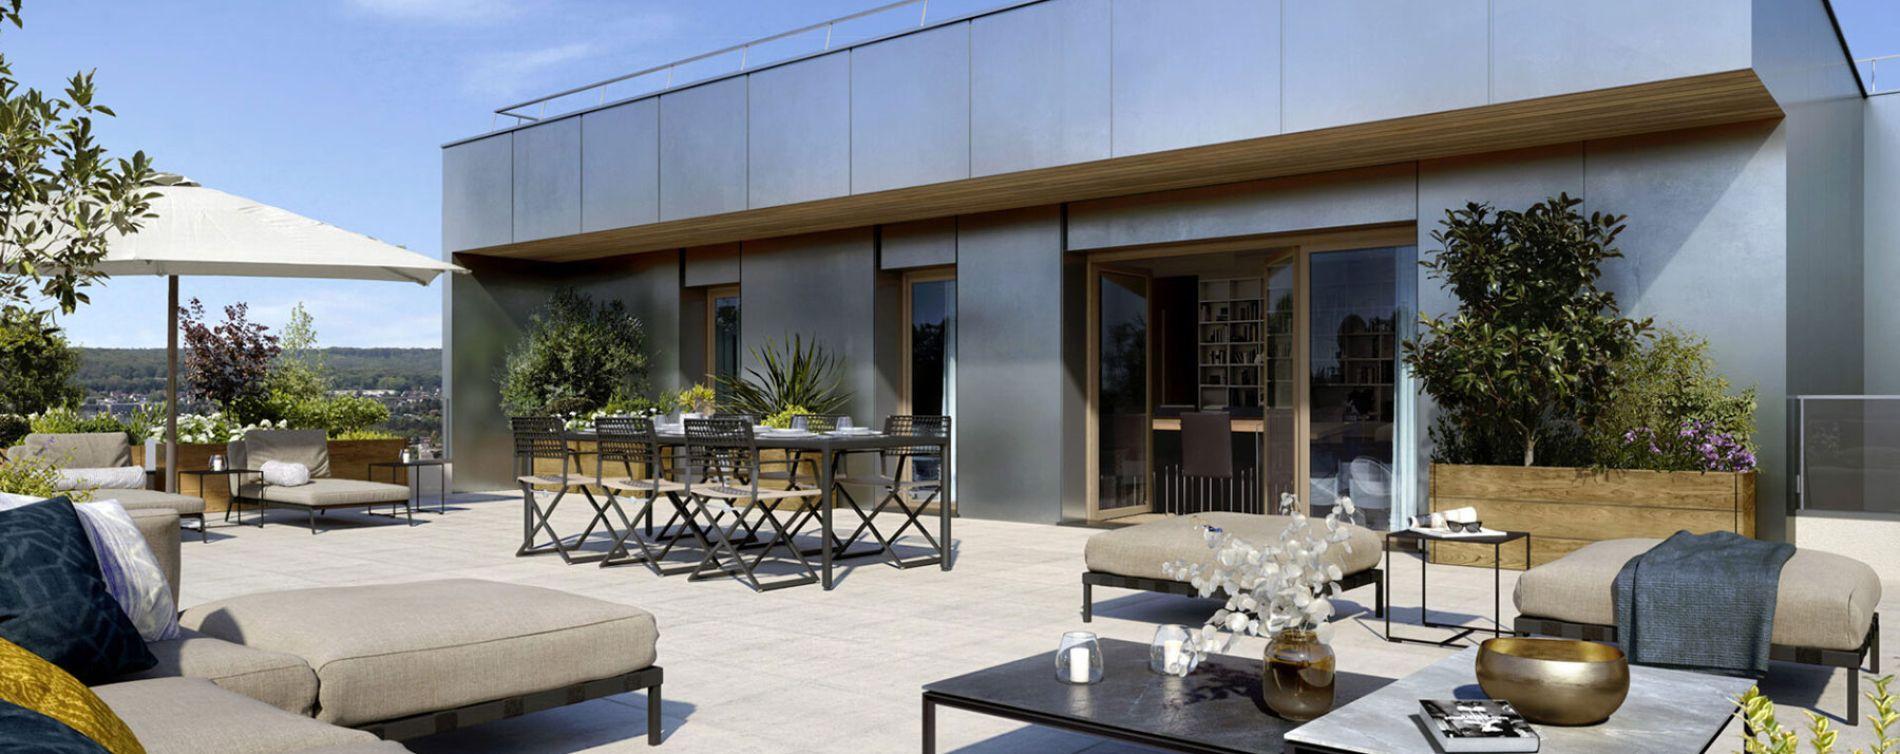 Rueil-Malmaison : programme immobilier neuve « Programme immobilier n°218735 » (4)